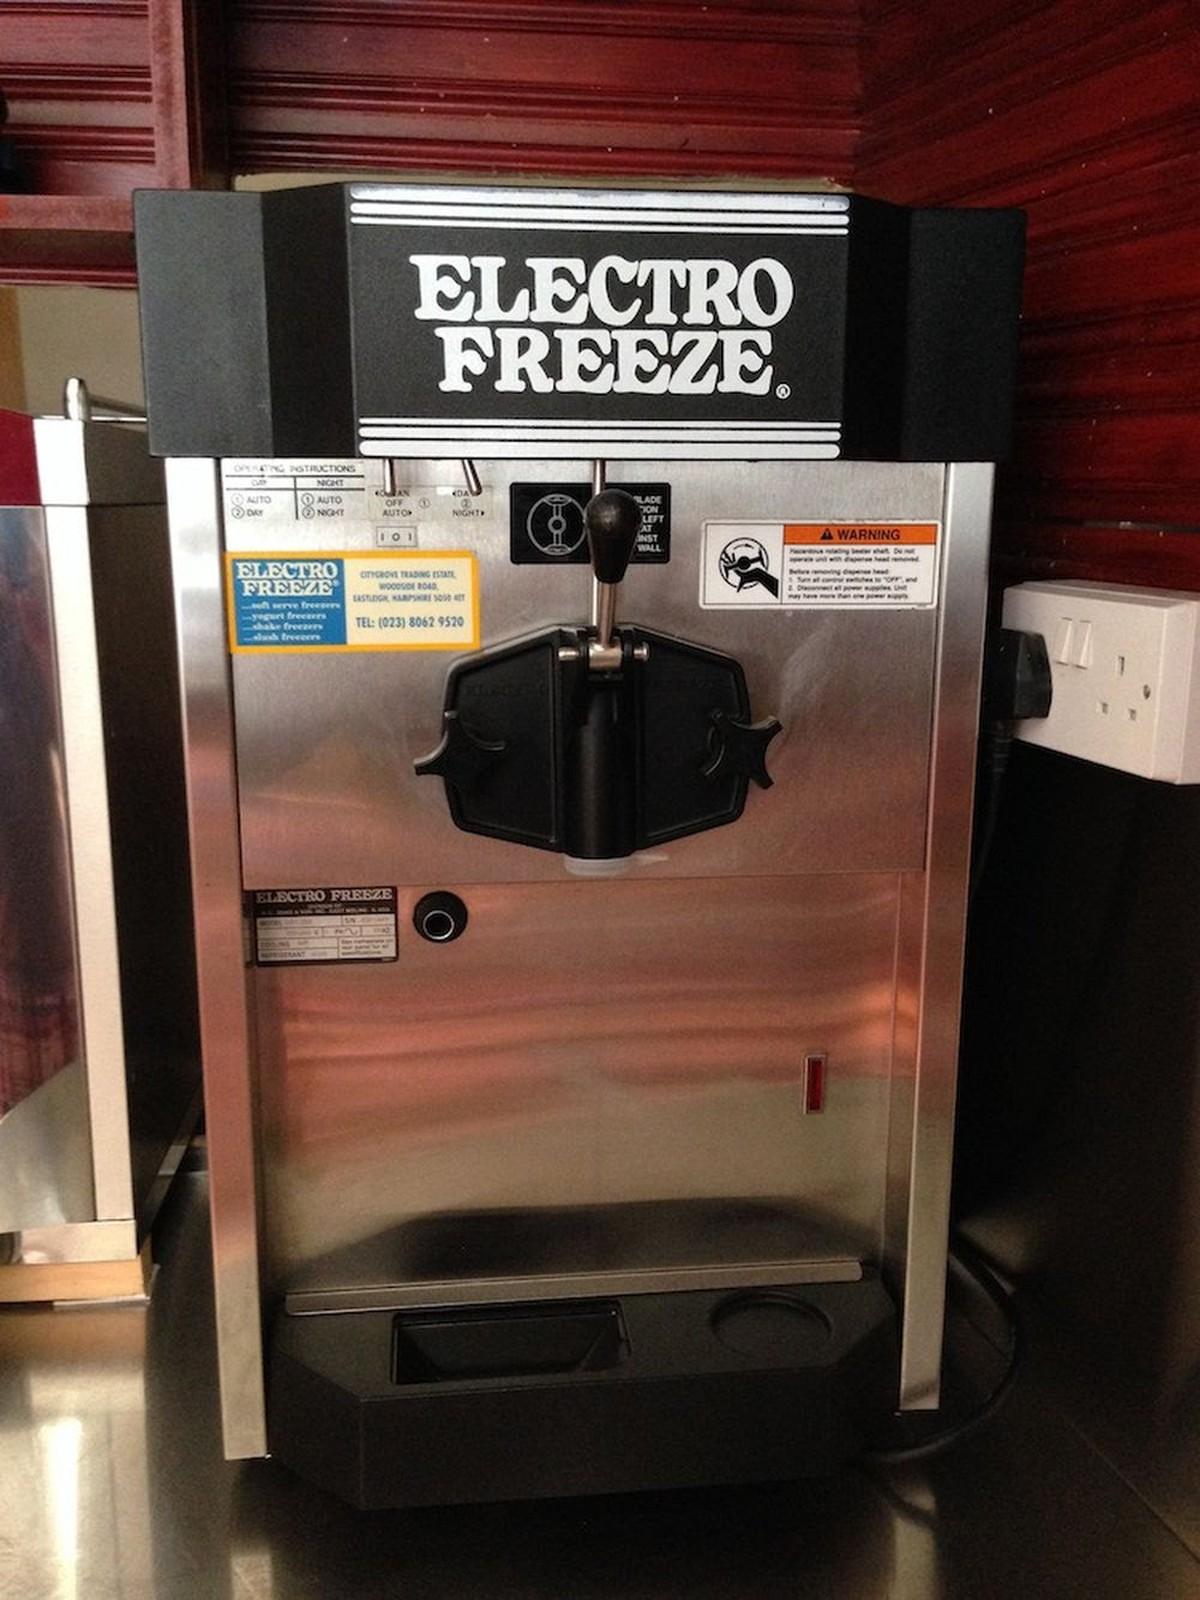 electro freeze soft serve machine